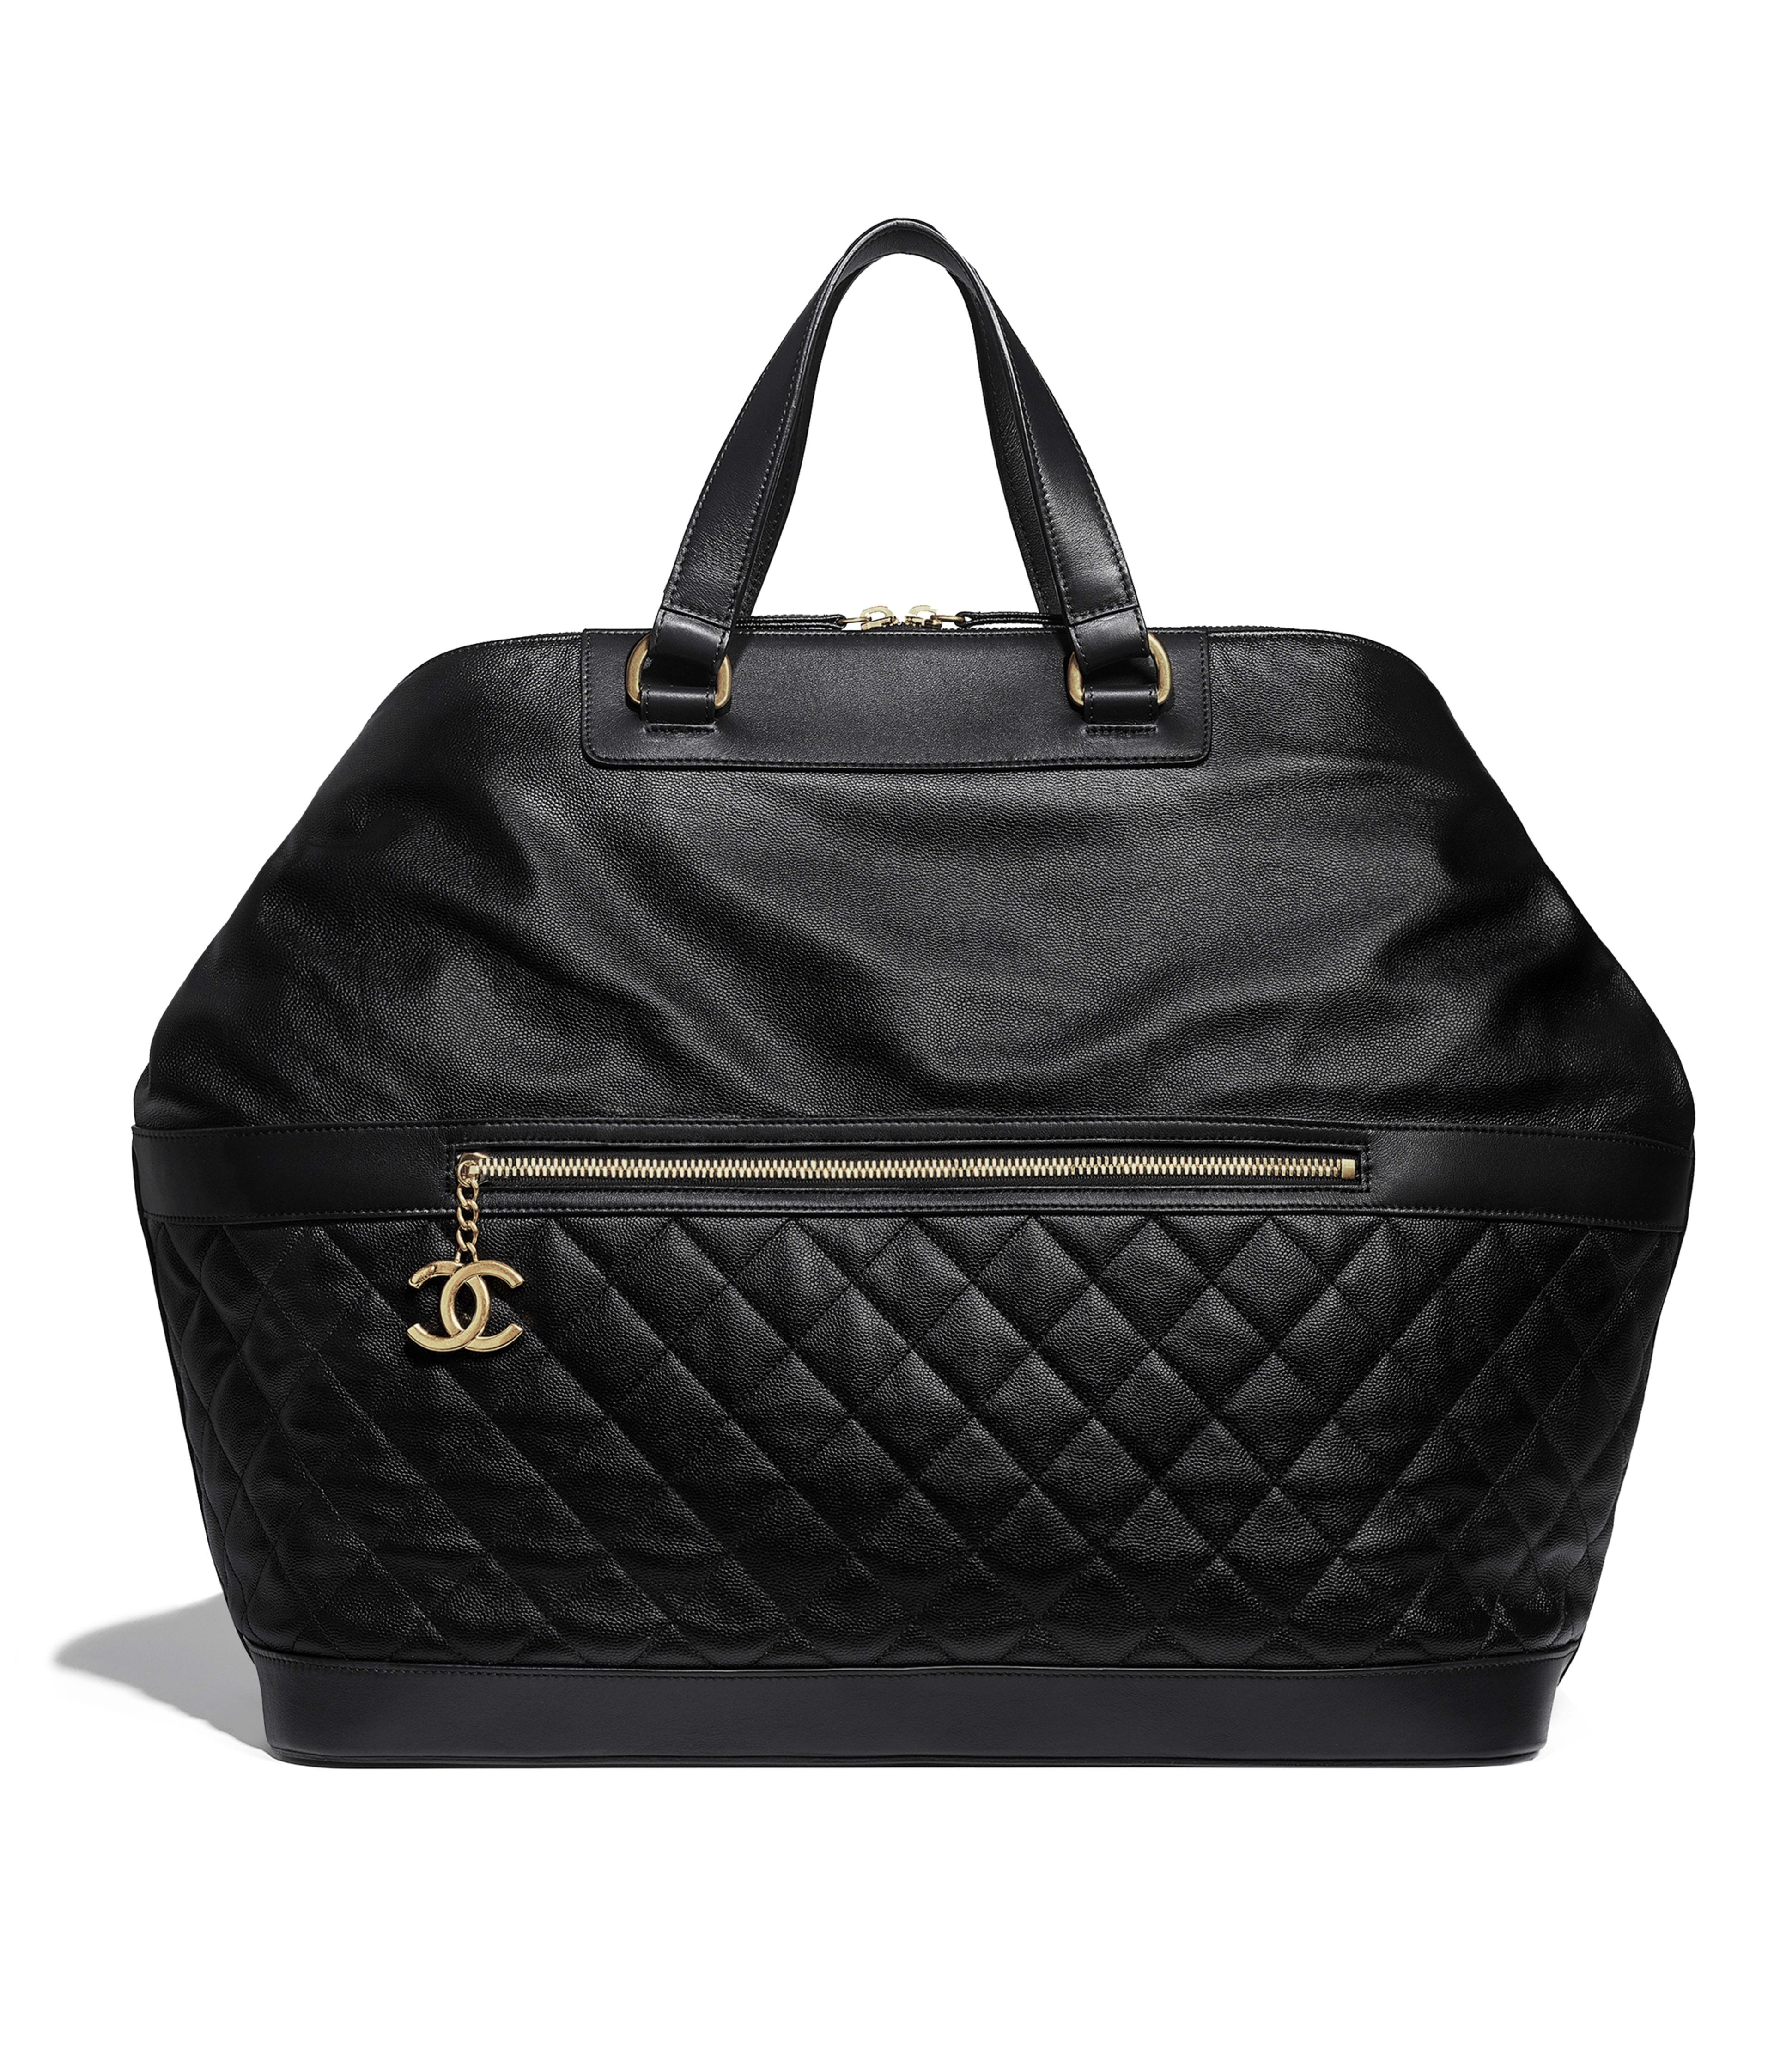 Bowling Bag Grained Calfskin Gold Tone Metal Black Ref A57969y8397894305